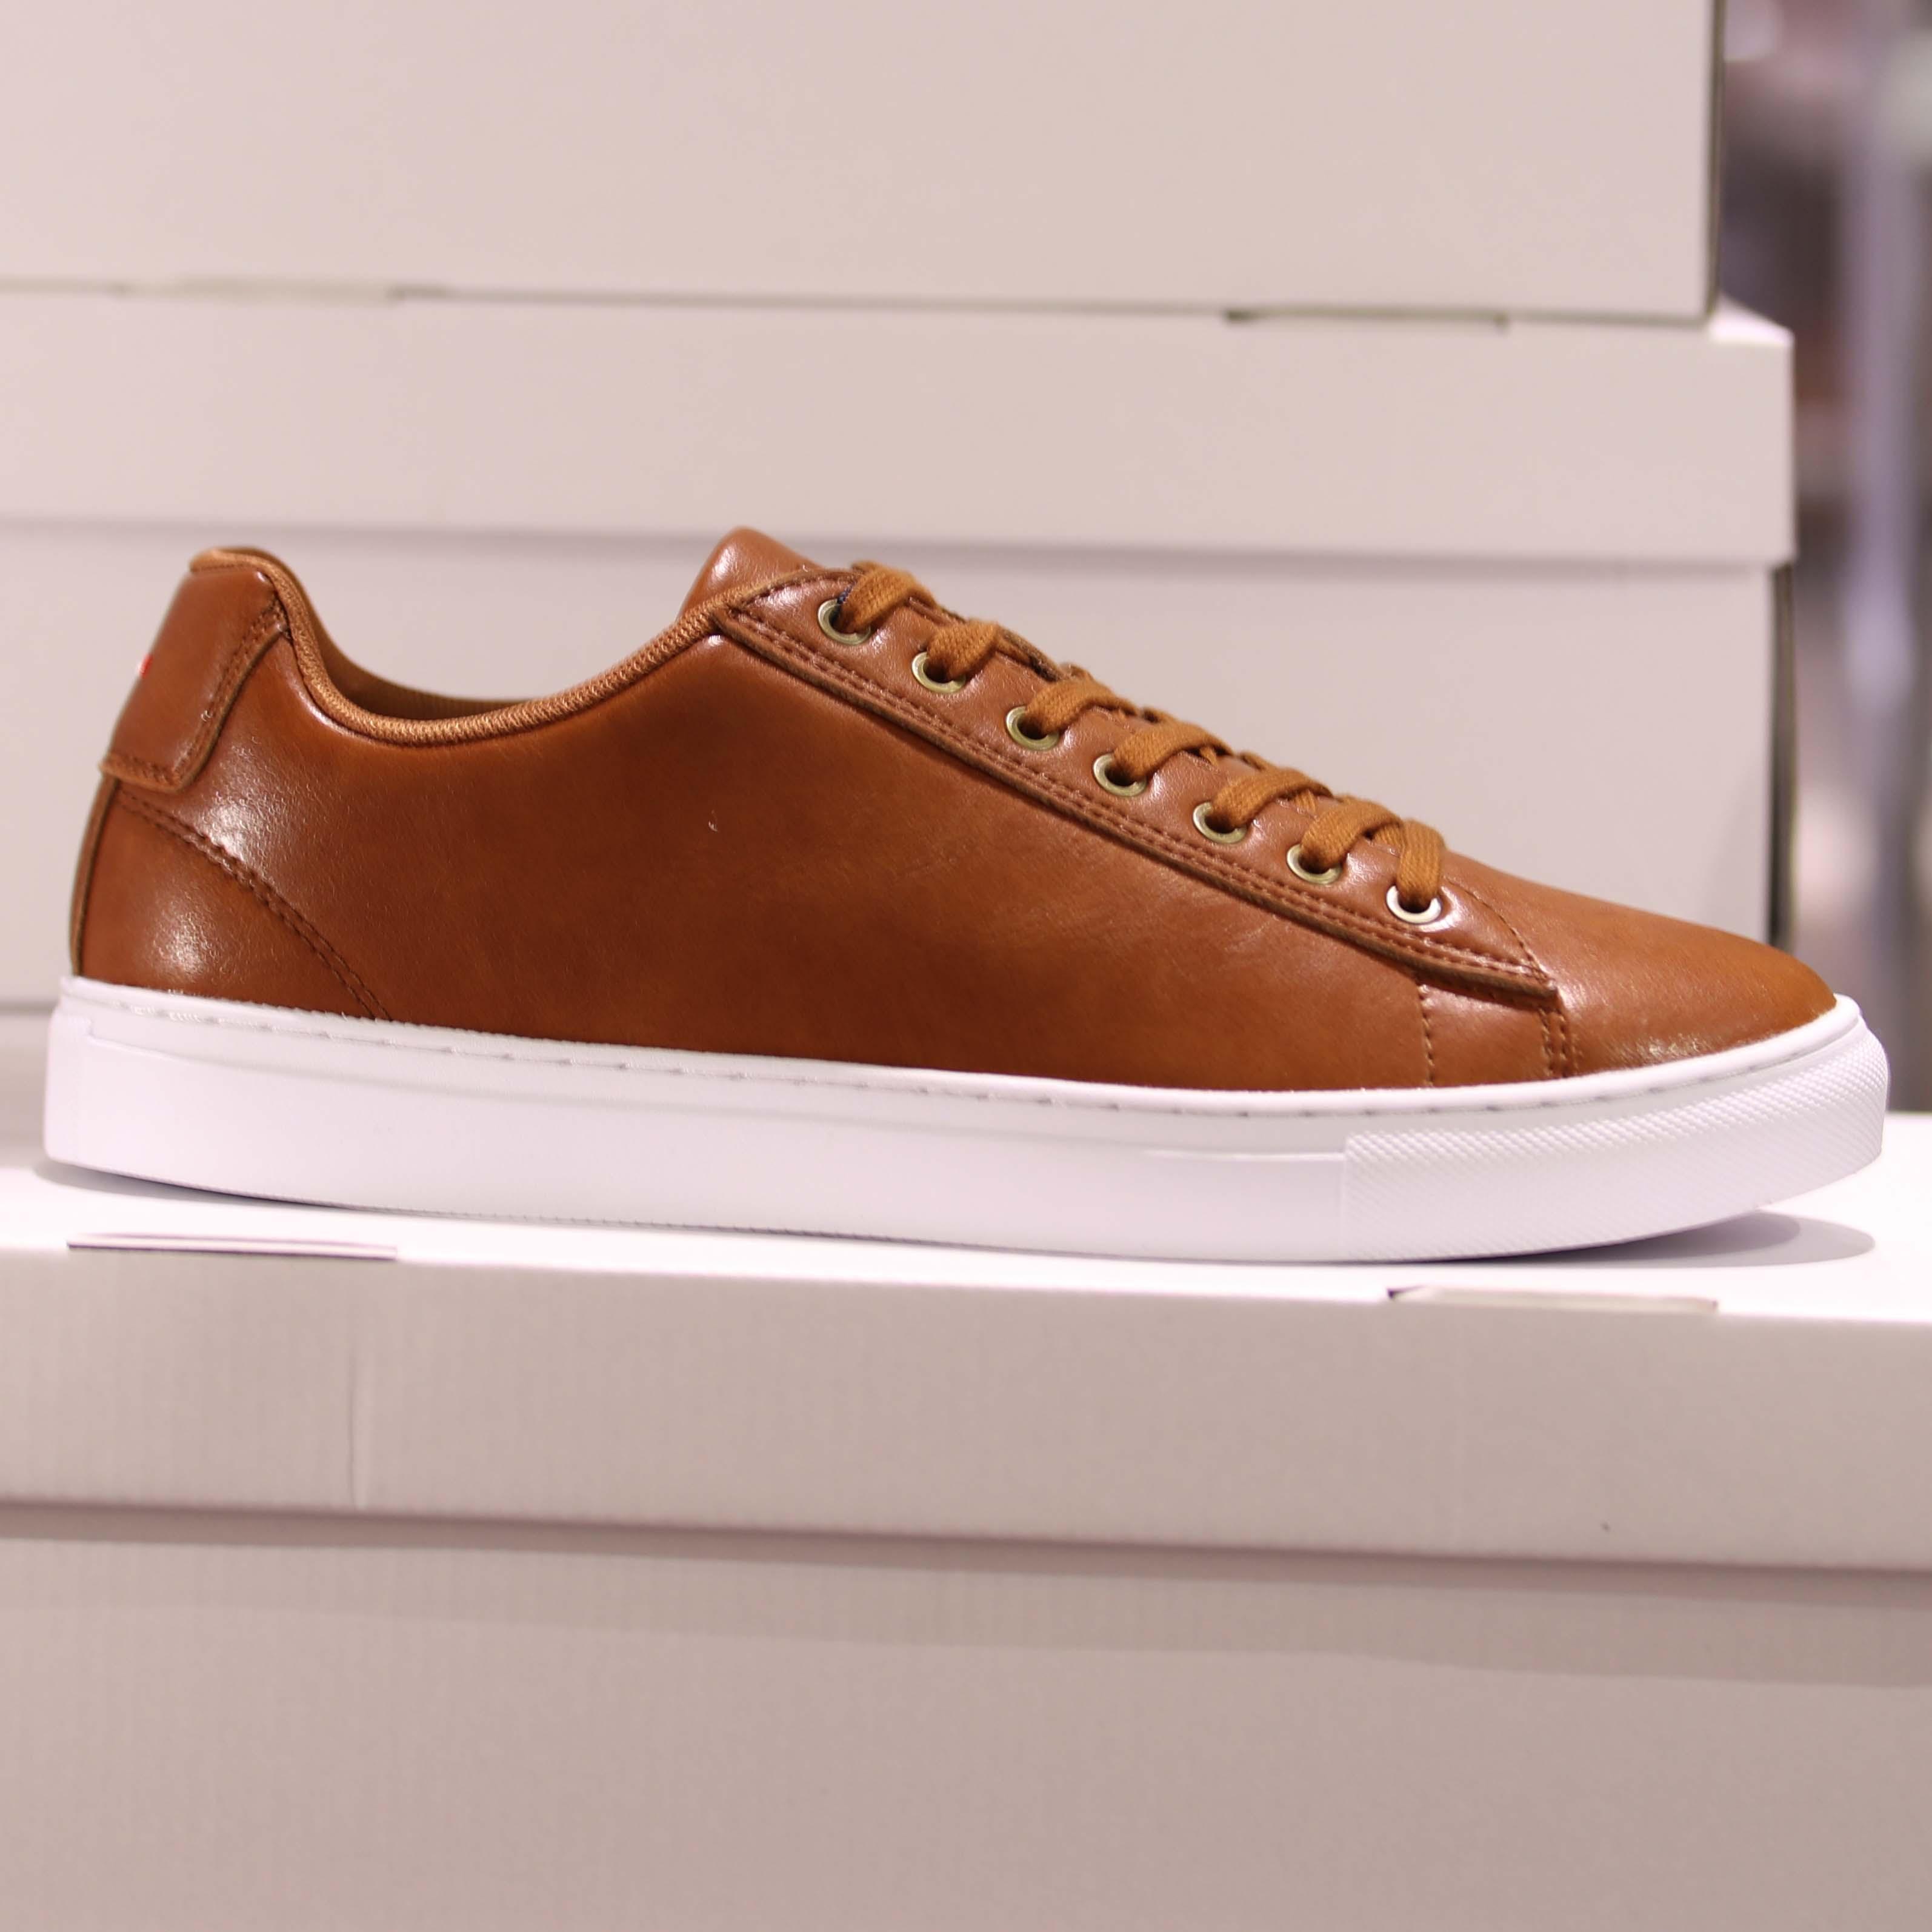 jean paul – reunion cognac herre sko høst5